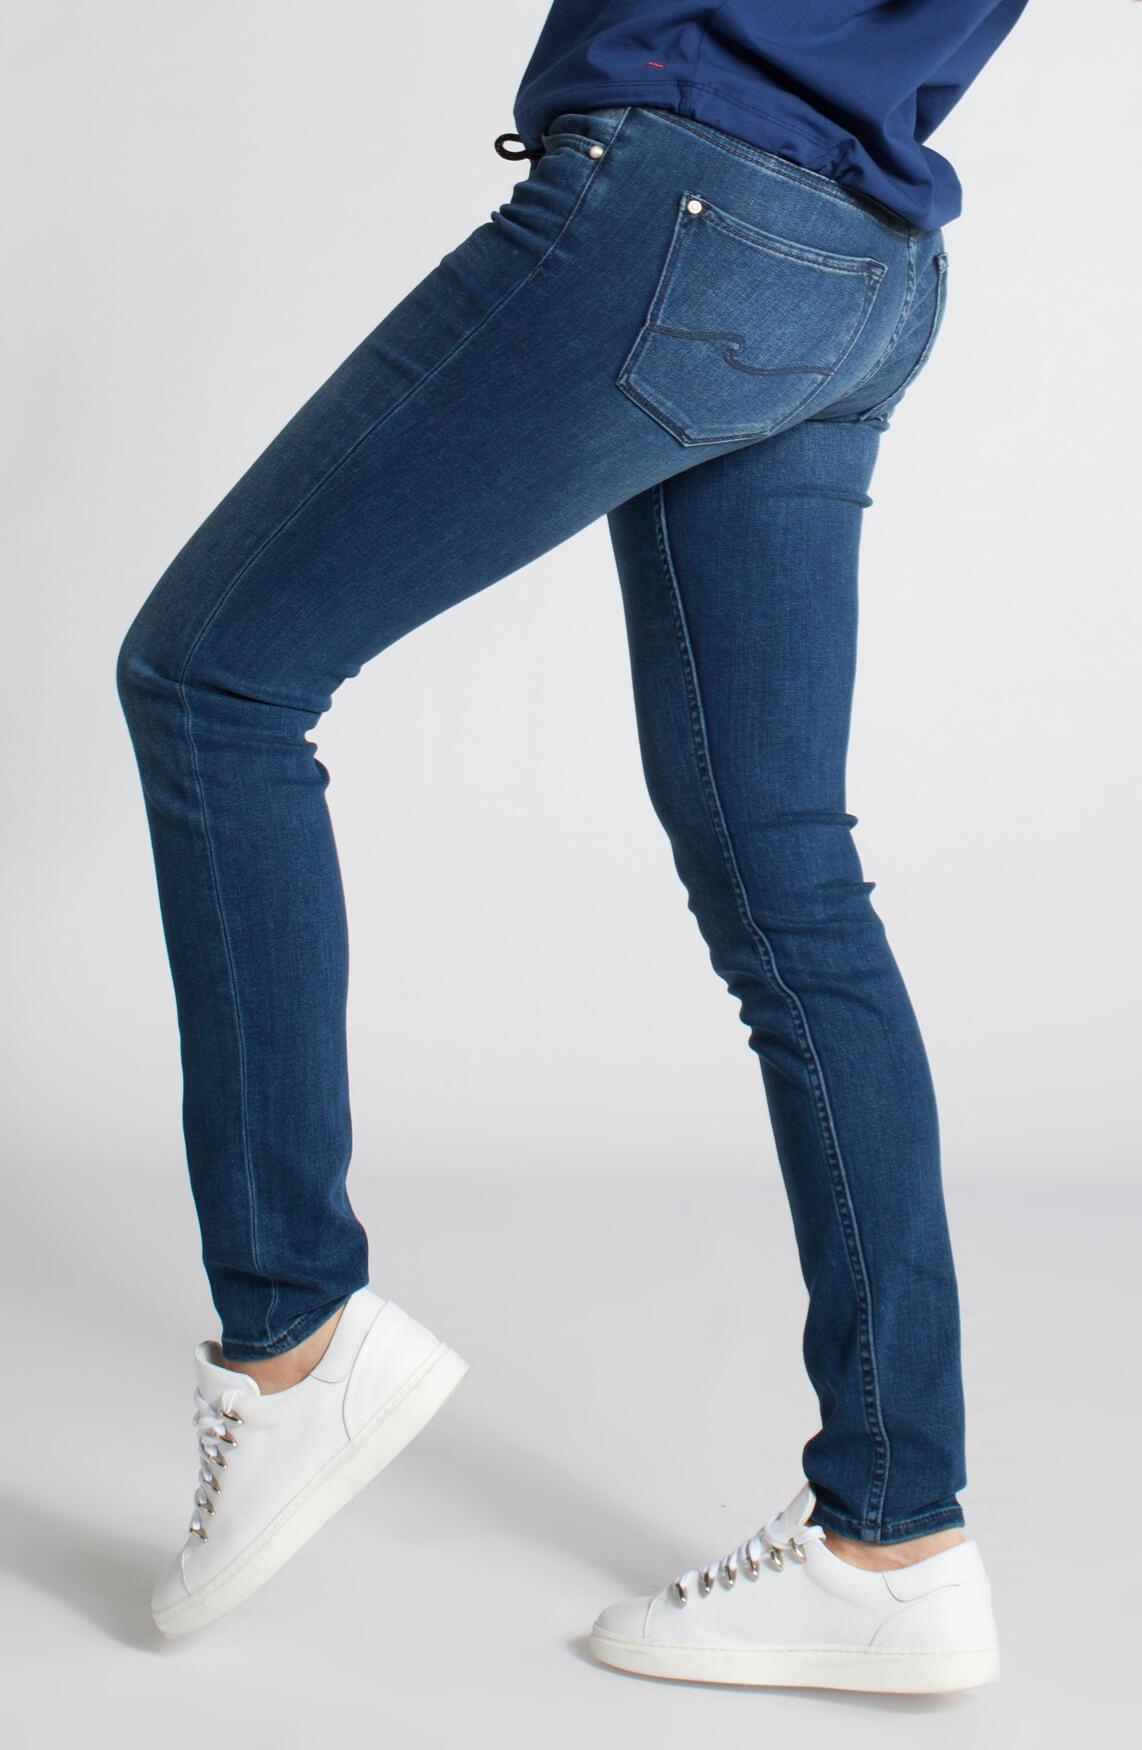 Rosner Dames Antonia jeans met parels